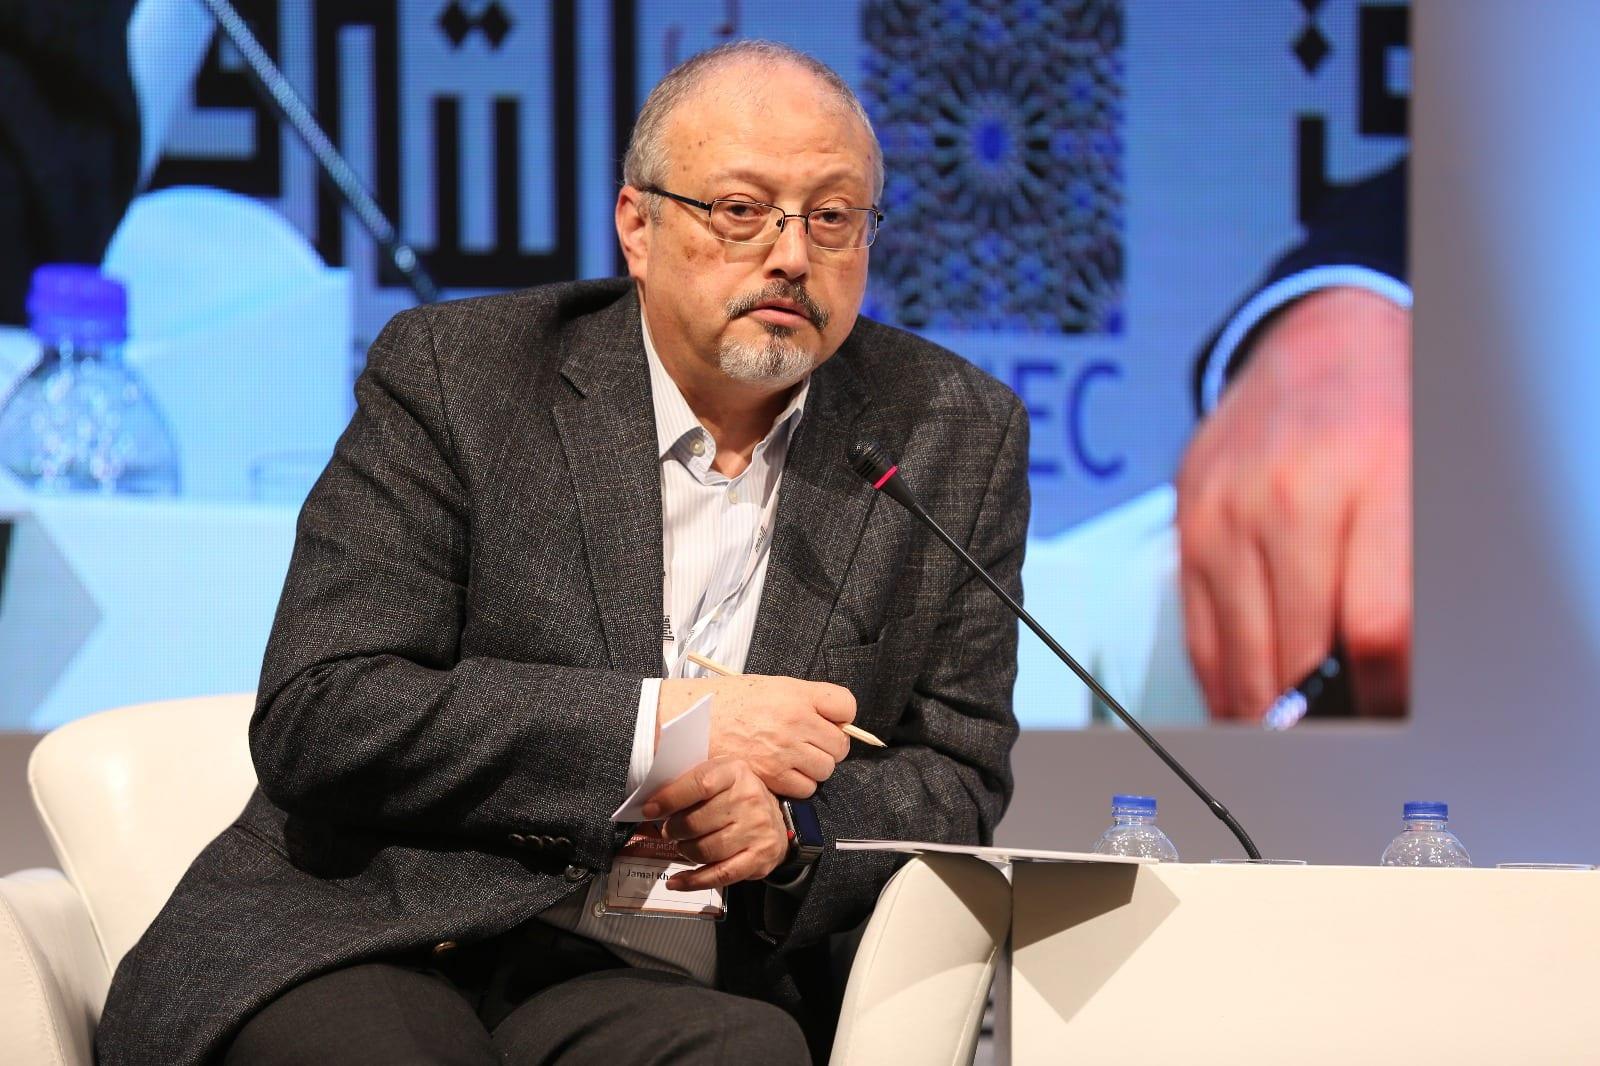 Khashoggi murder: Trump reiterates support for Mohammed bin Salman